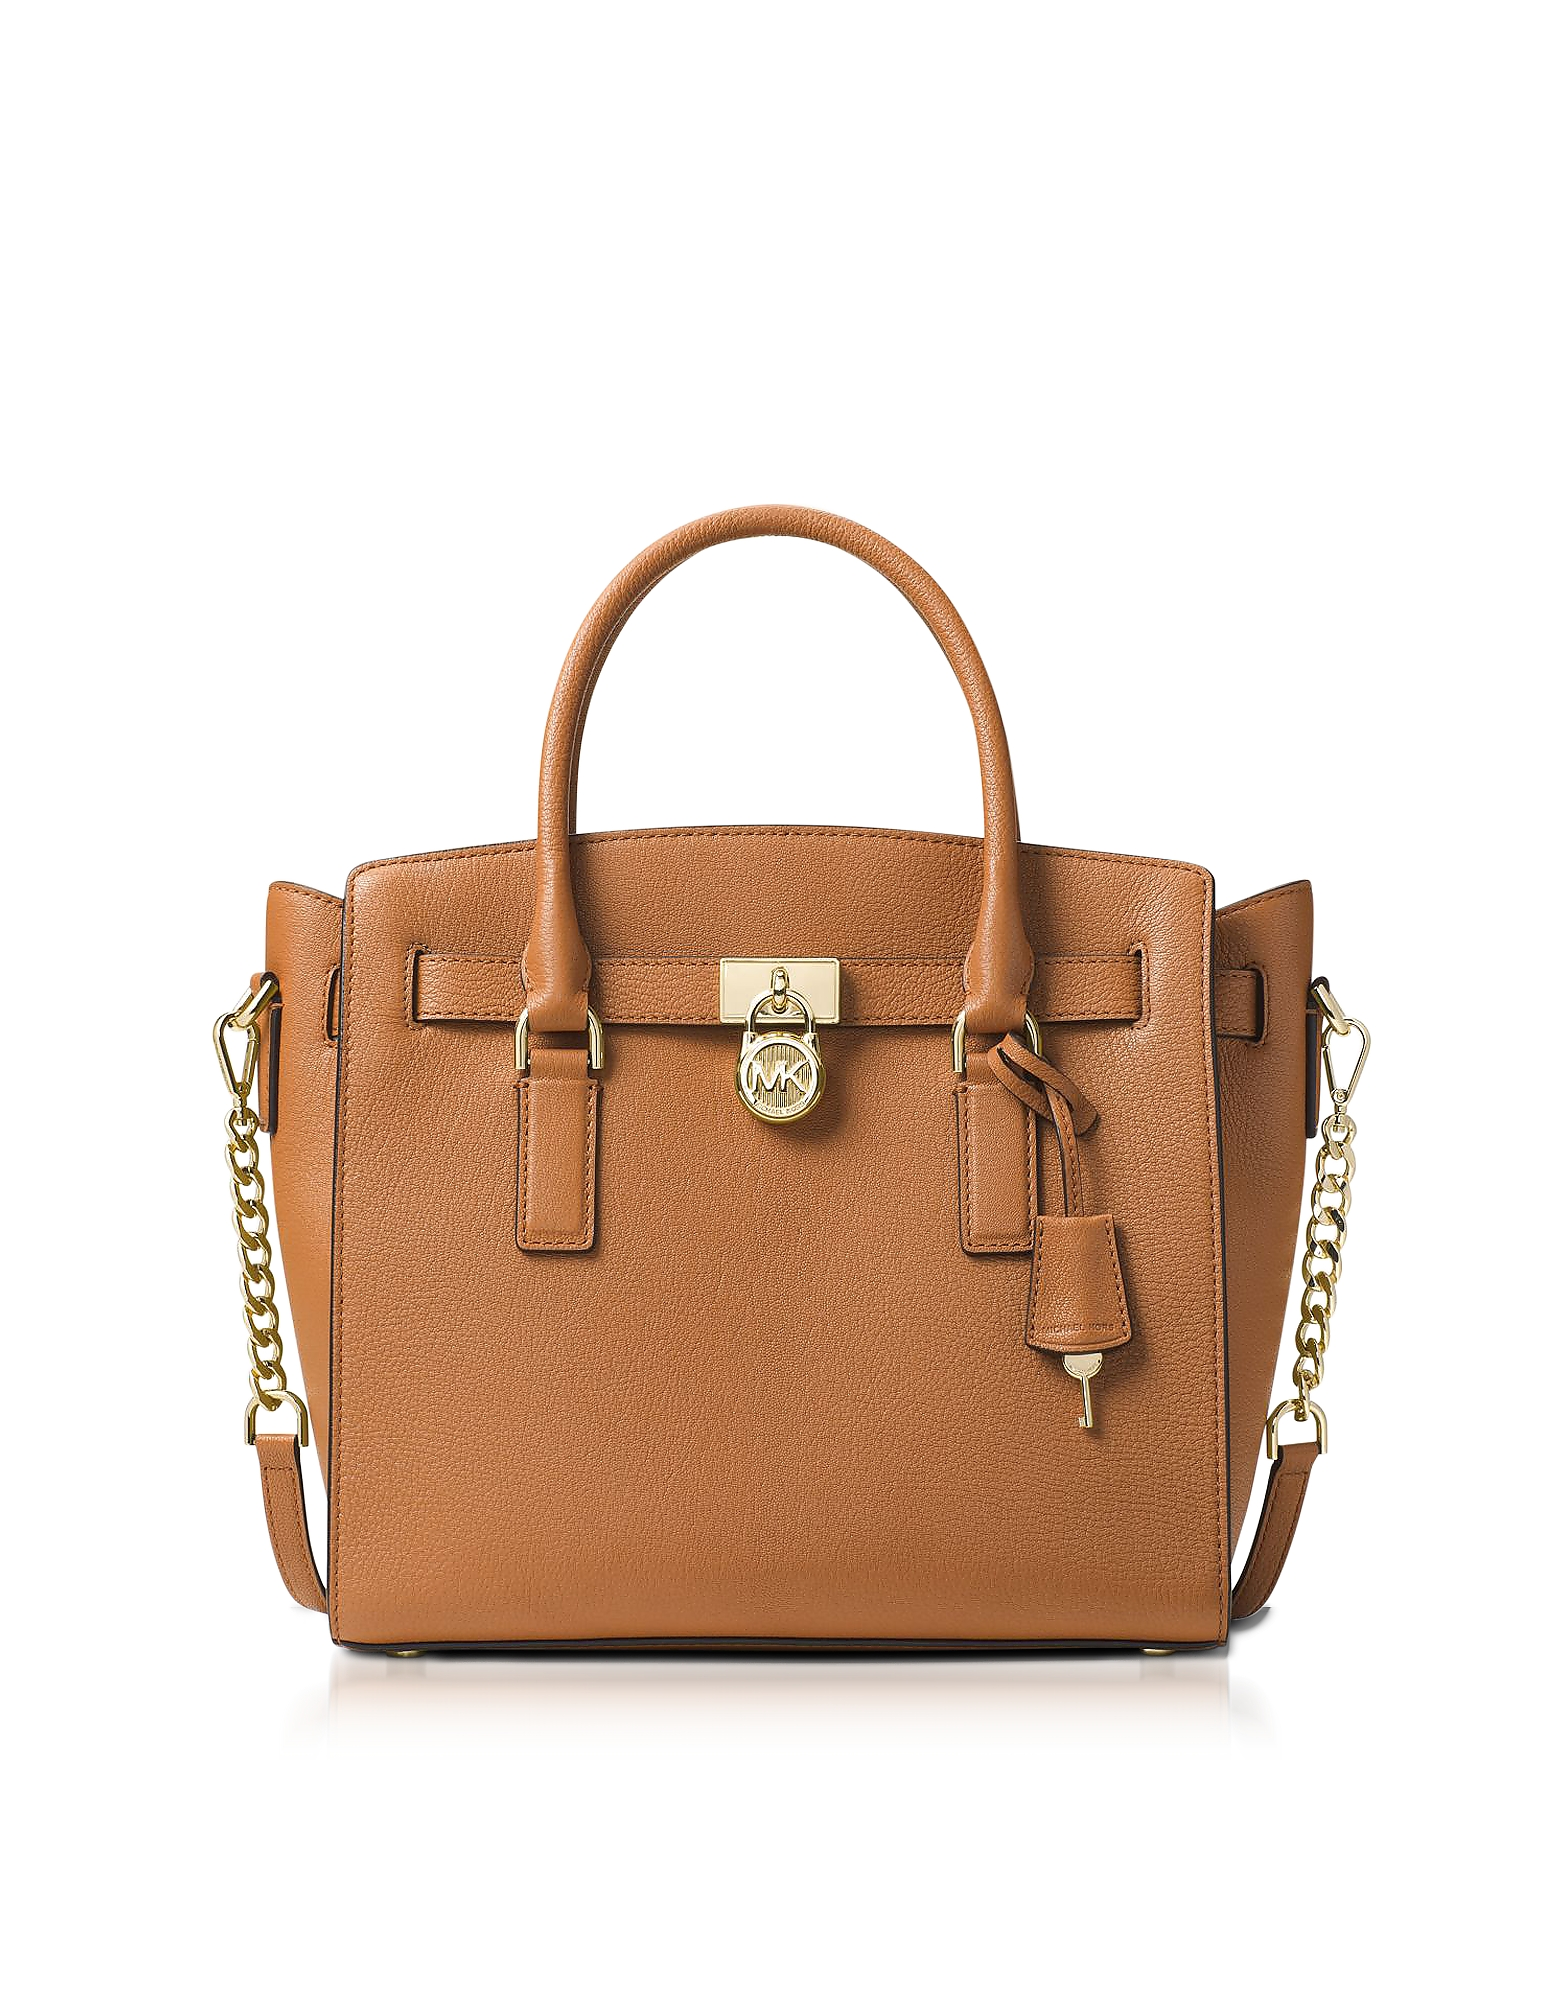 Michael Kors Handbags, Hamilton Large Acorn Pebbled Leather Satchel Bag